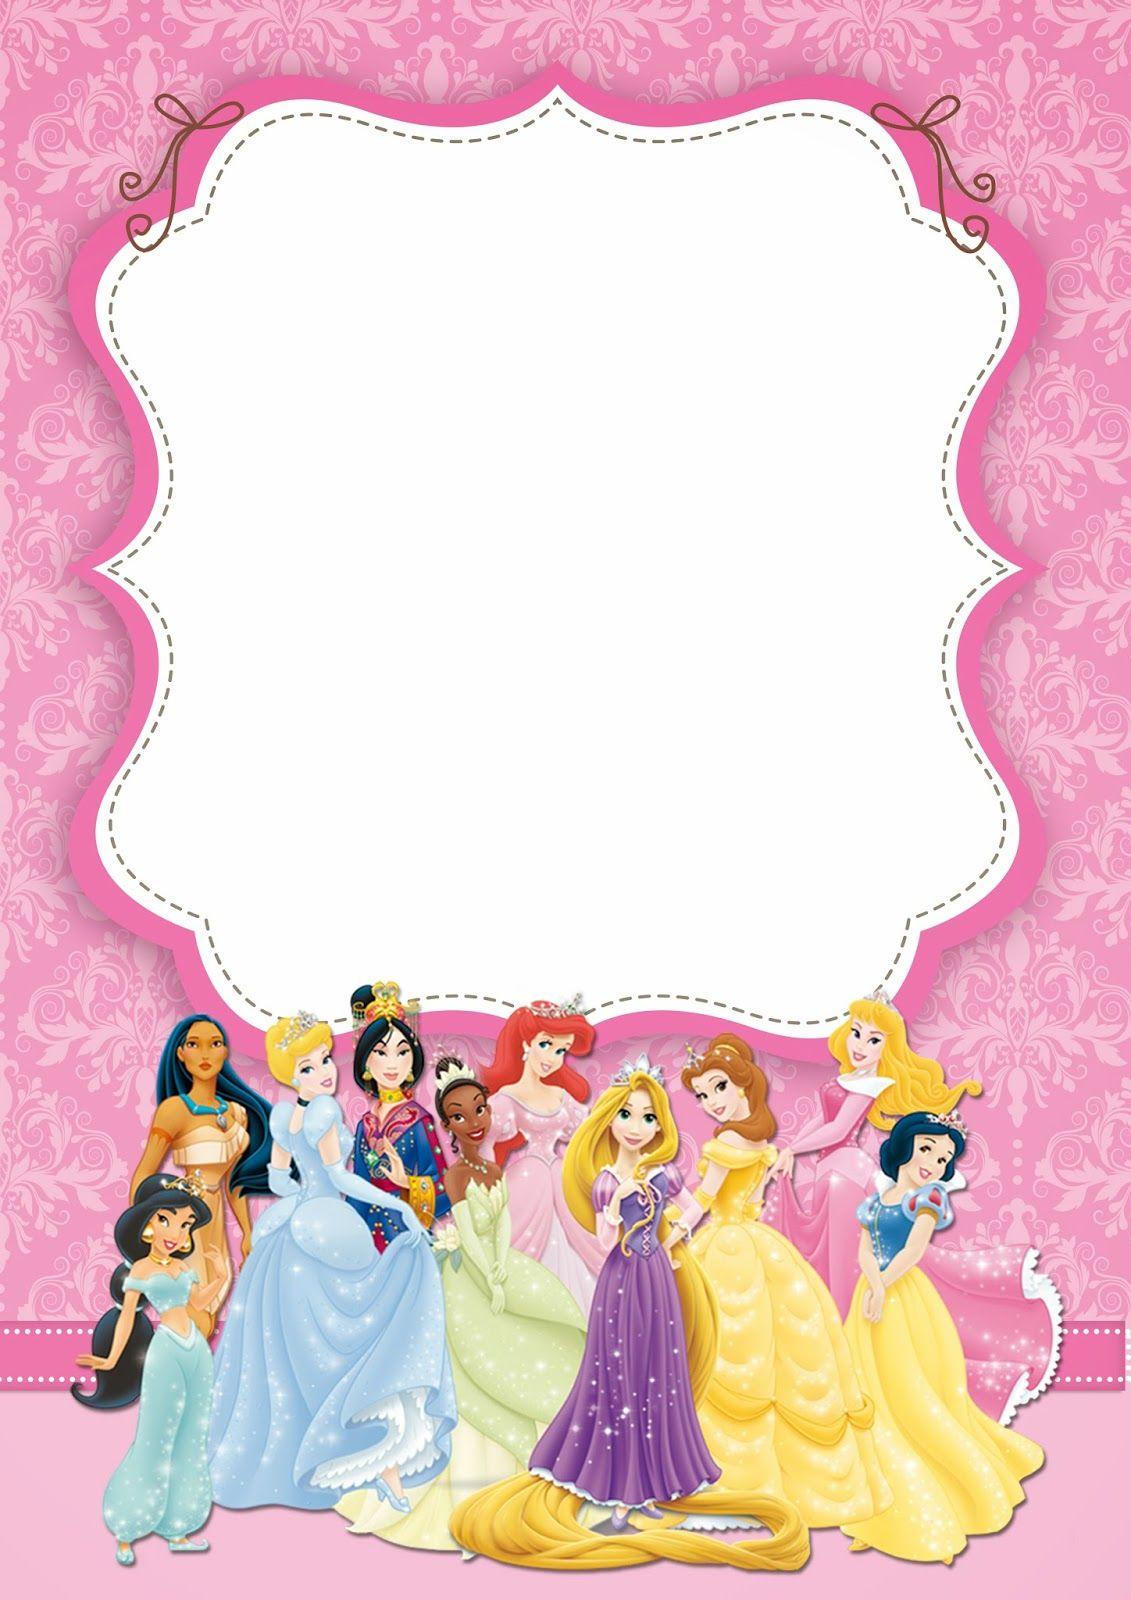 Disney Princess Party: Free Printable Party Invitations. | Oh My - Free Printable Disney Invitations